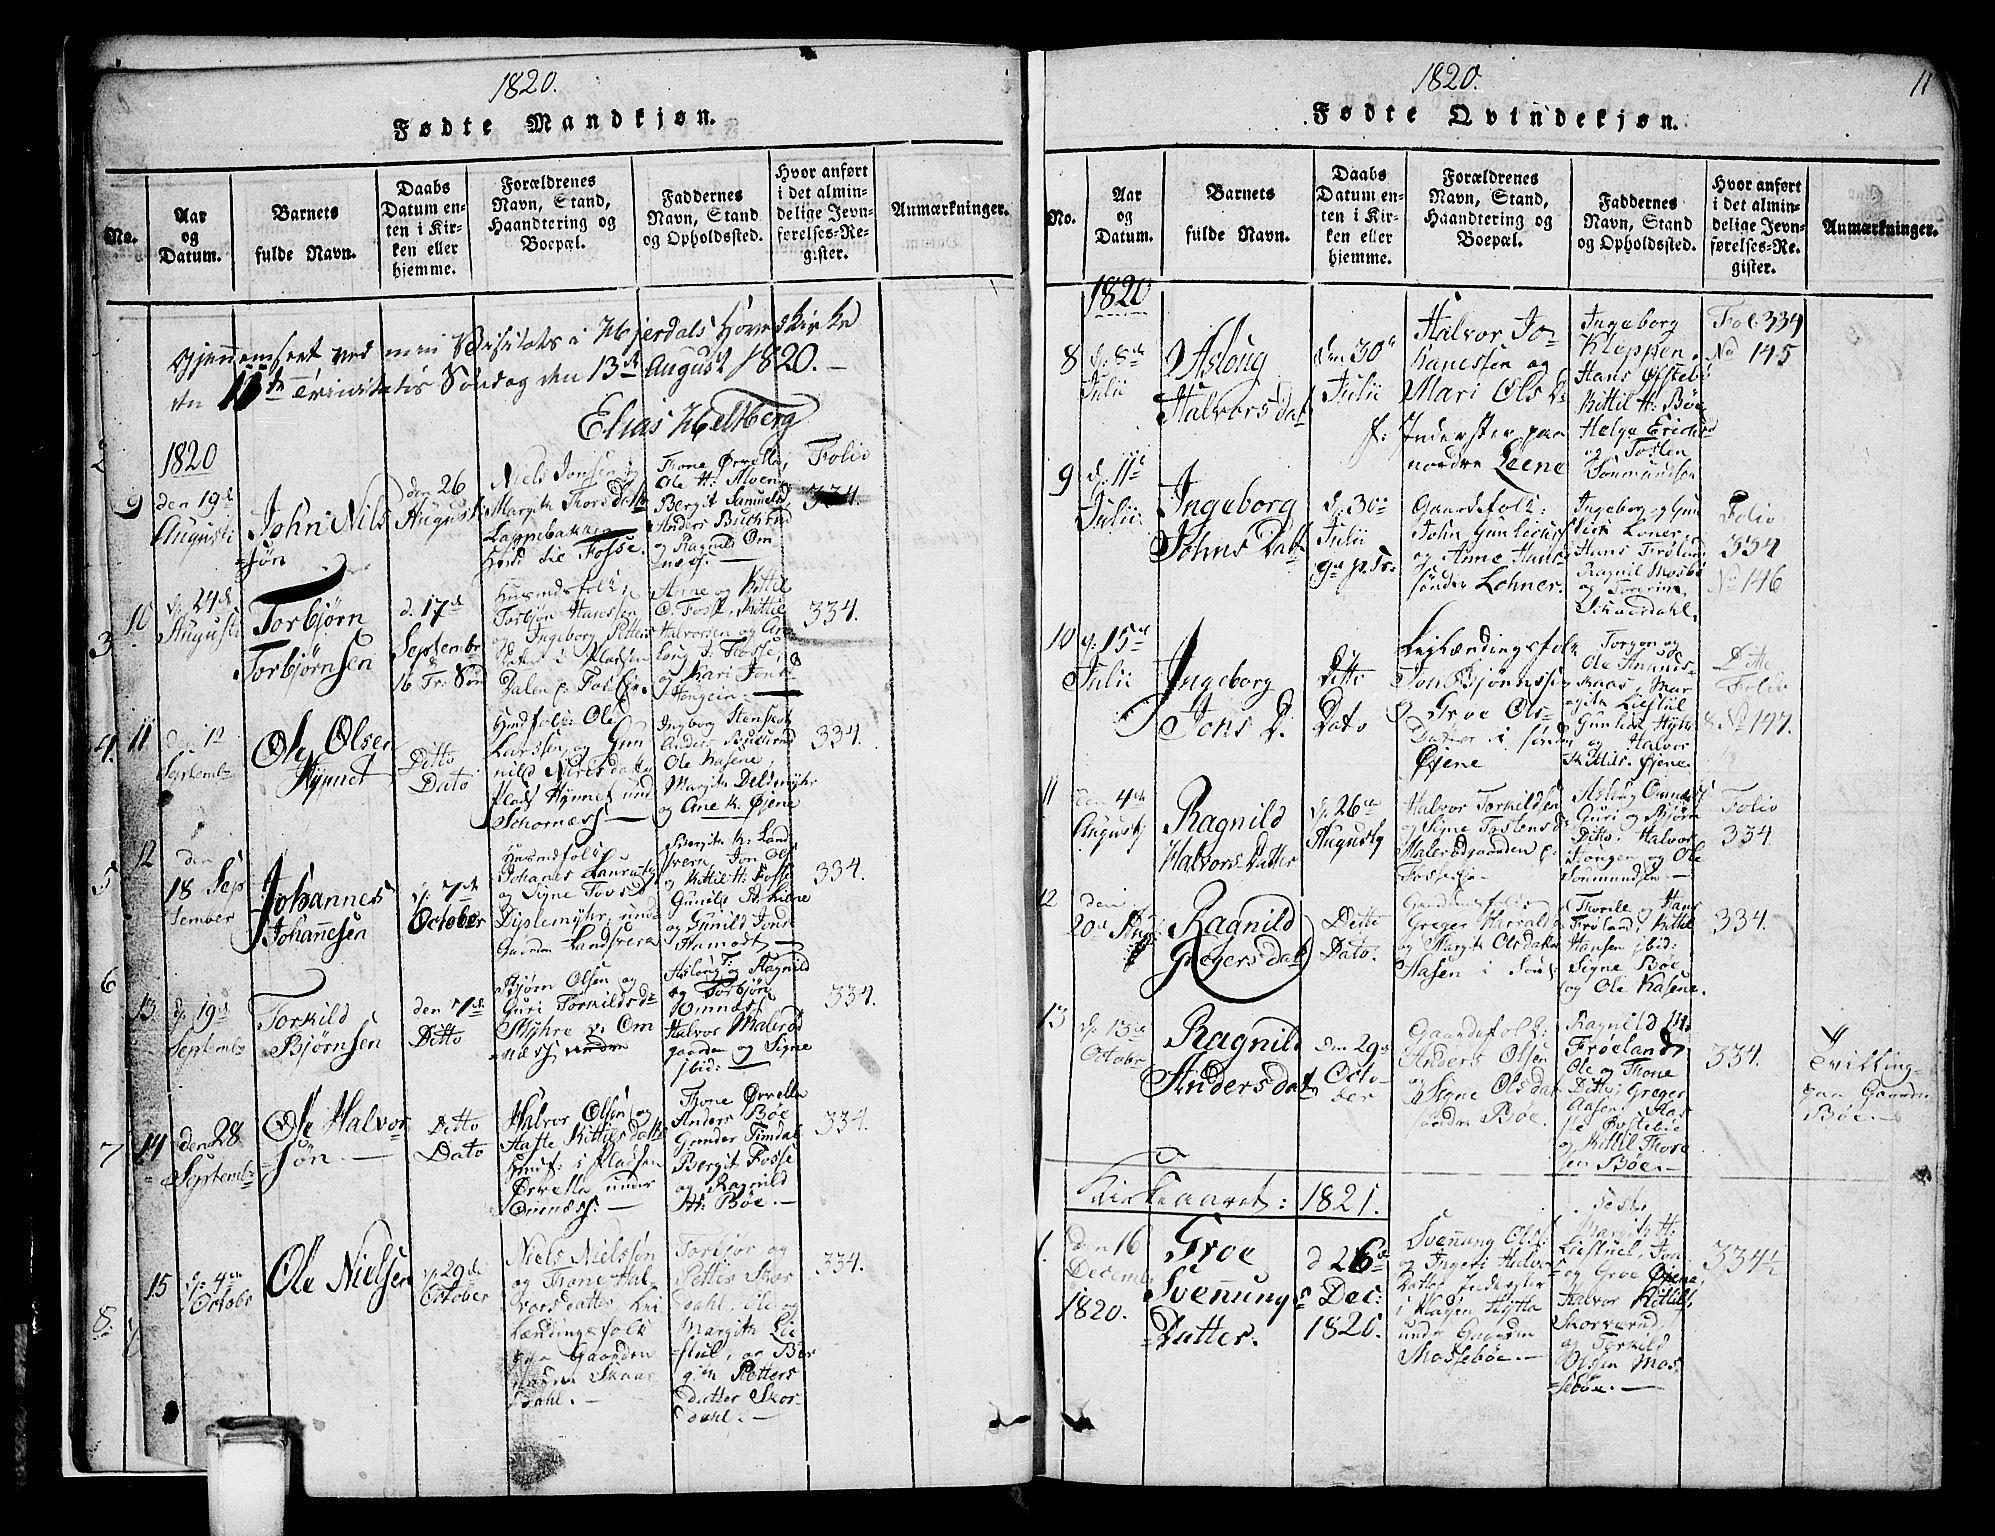 SAKO, Hjartdal kirkebøker, G/Gb/L0001: Klokkerbok nr. II 1, 1815-1842, s. 11